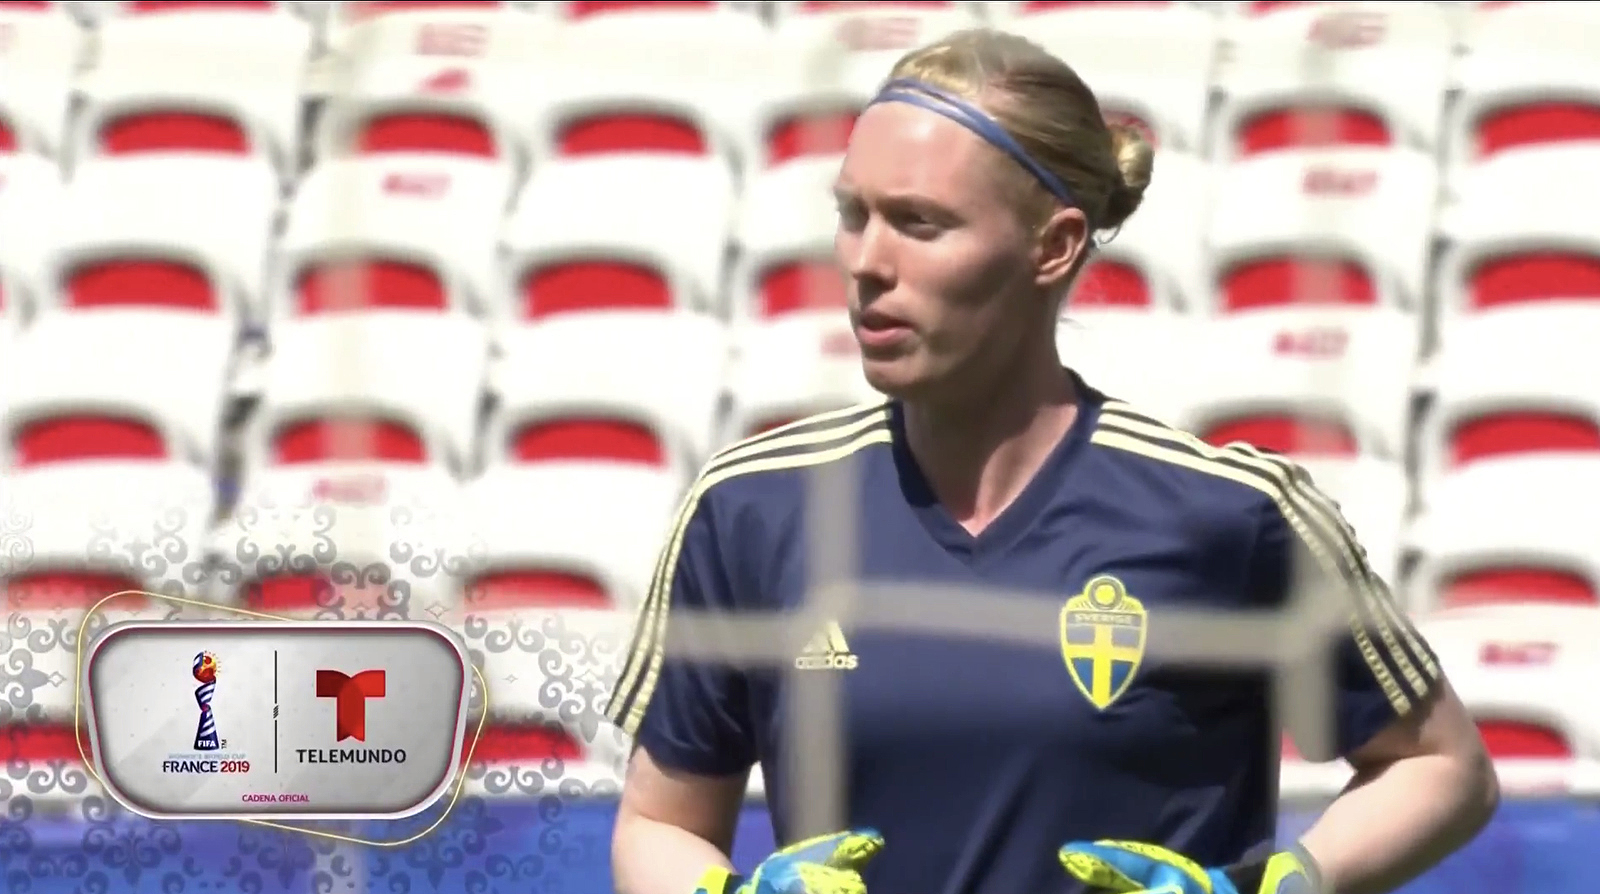 NCS_Telemundo-FIFA-Womens-World-Cup-2019_GFX_0029